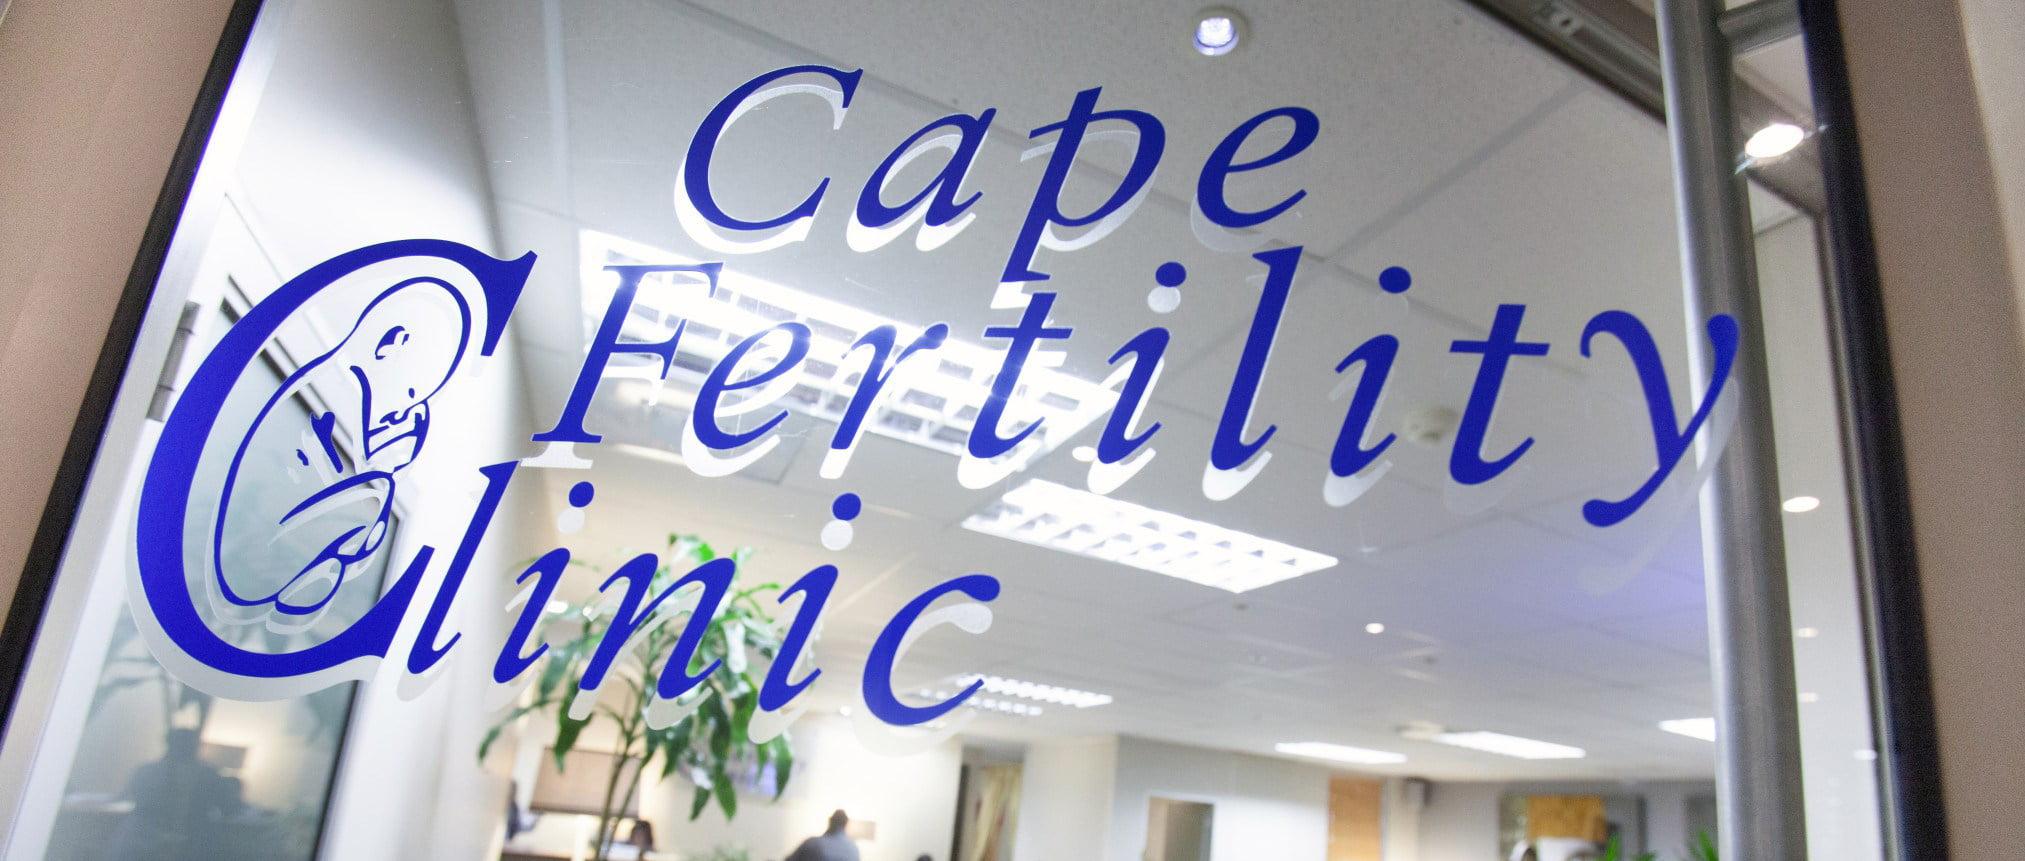 Cape-Fertility-Clinic-Entrance door